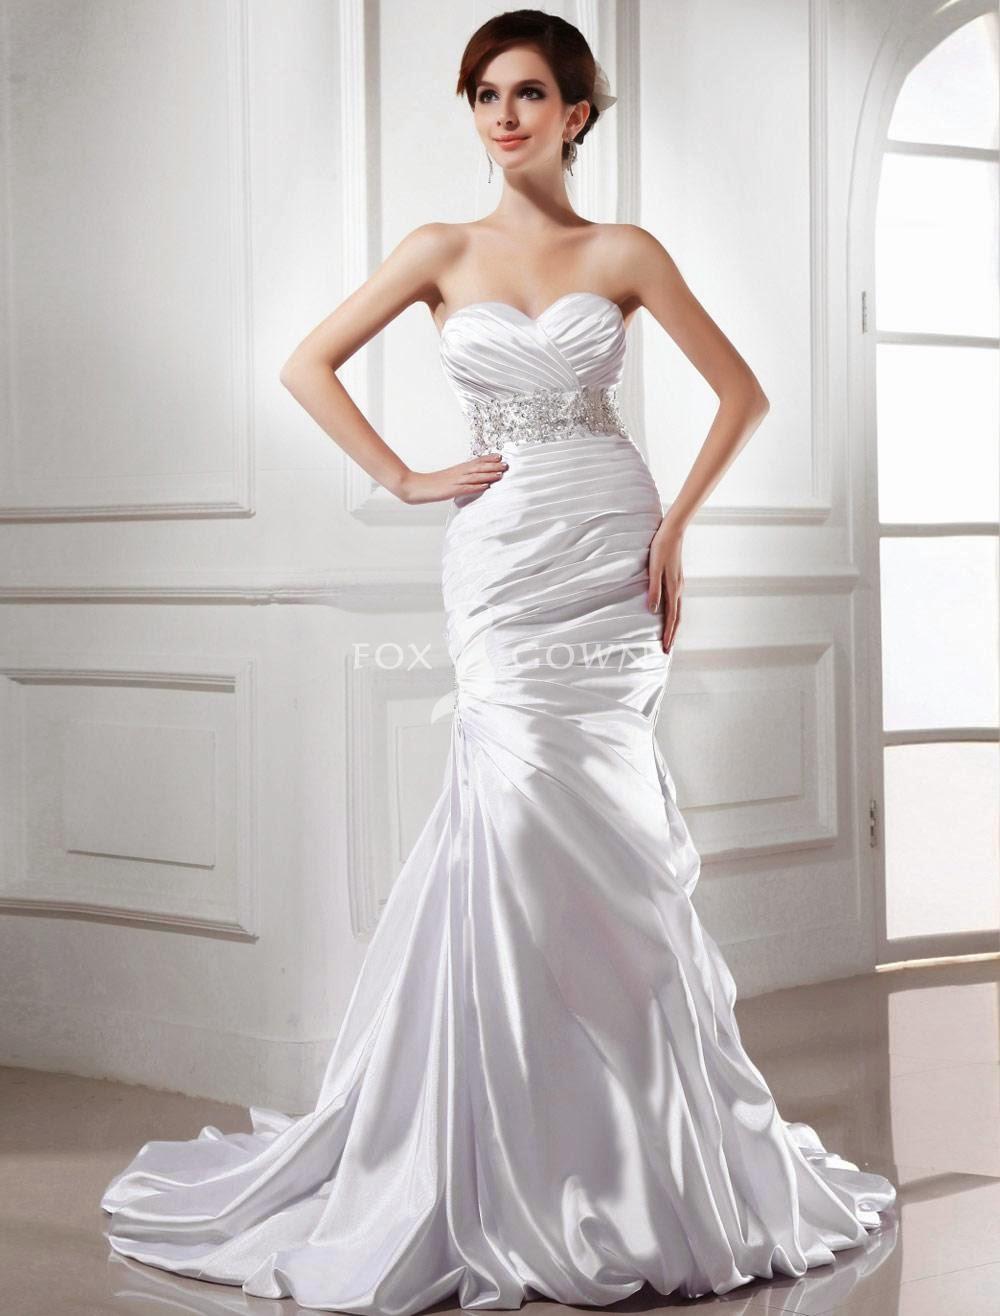 wedding dresses; wedding dress; wedding gown; satin wedding dresses; satin wedding gown; a line wedding dresses; a line wedding gown; wedding dress belt; wedding gown belt